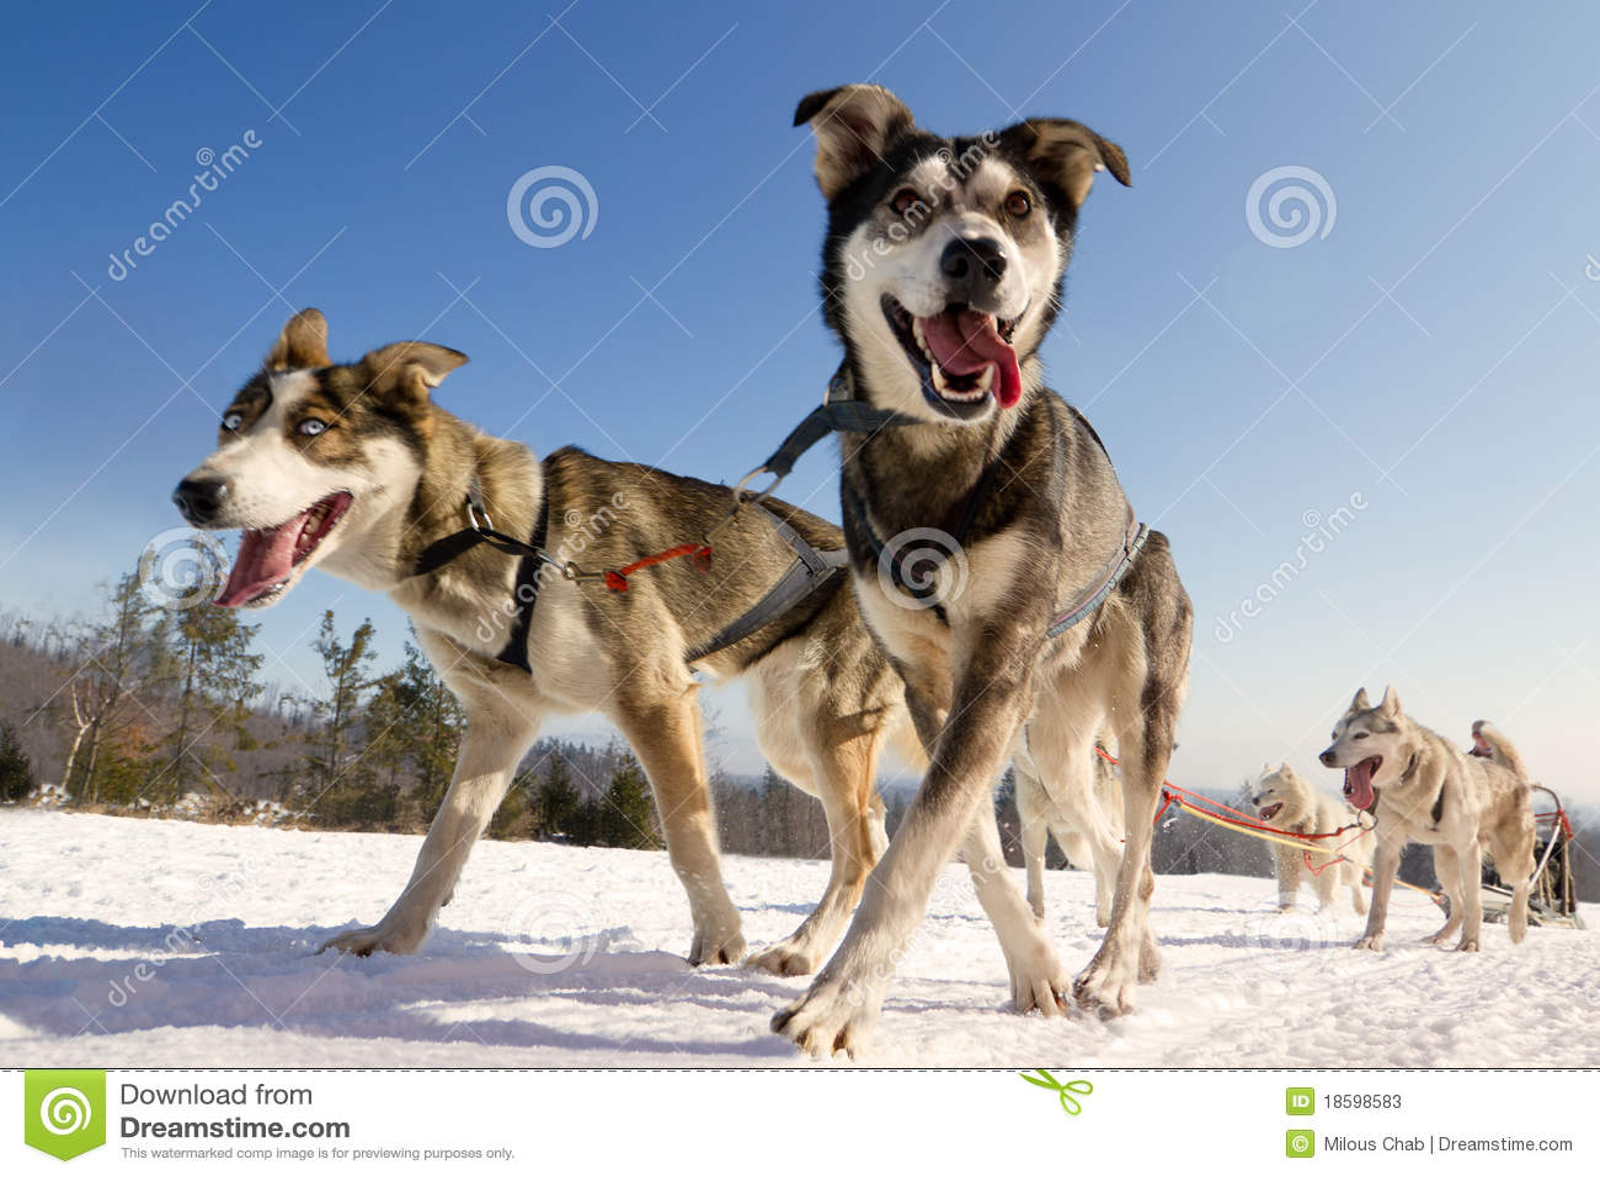 Close up of a sled dog, heading towards the camer